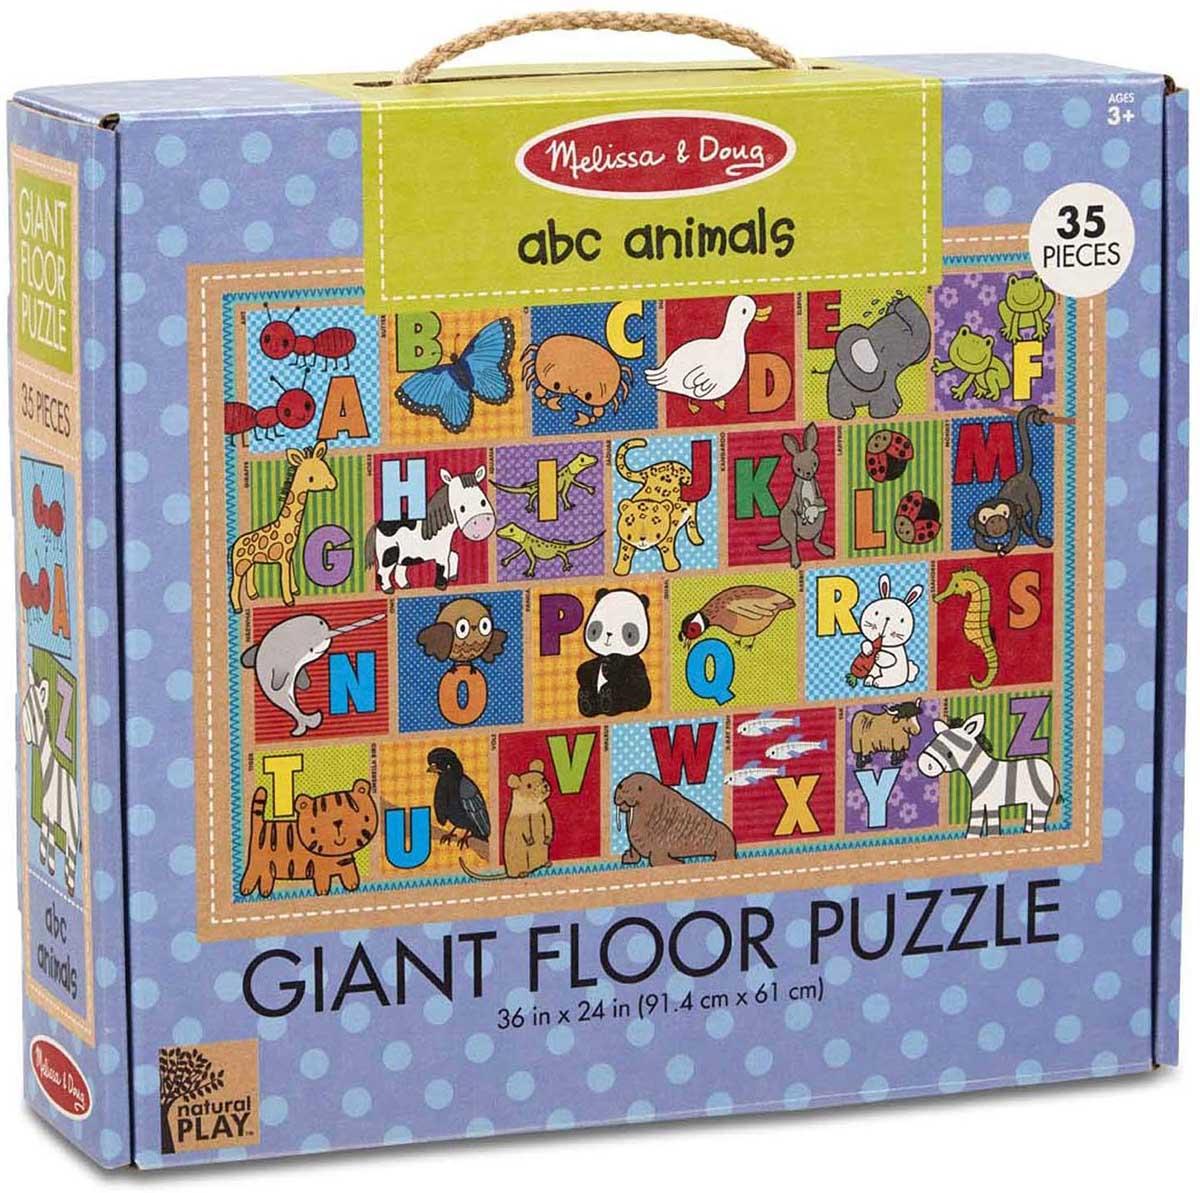 Green Start Giant Floor Puzzle - ABC Animals Animals Floor Puzzle